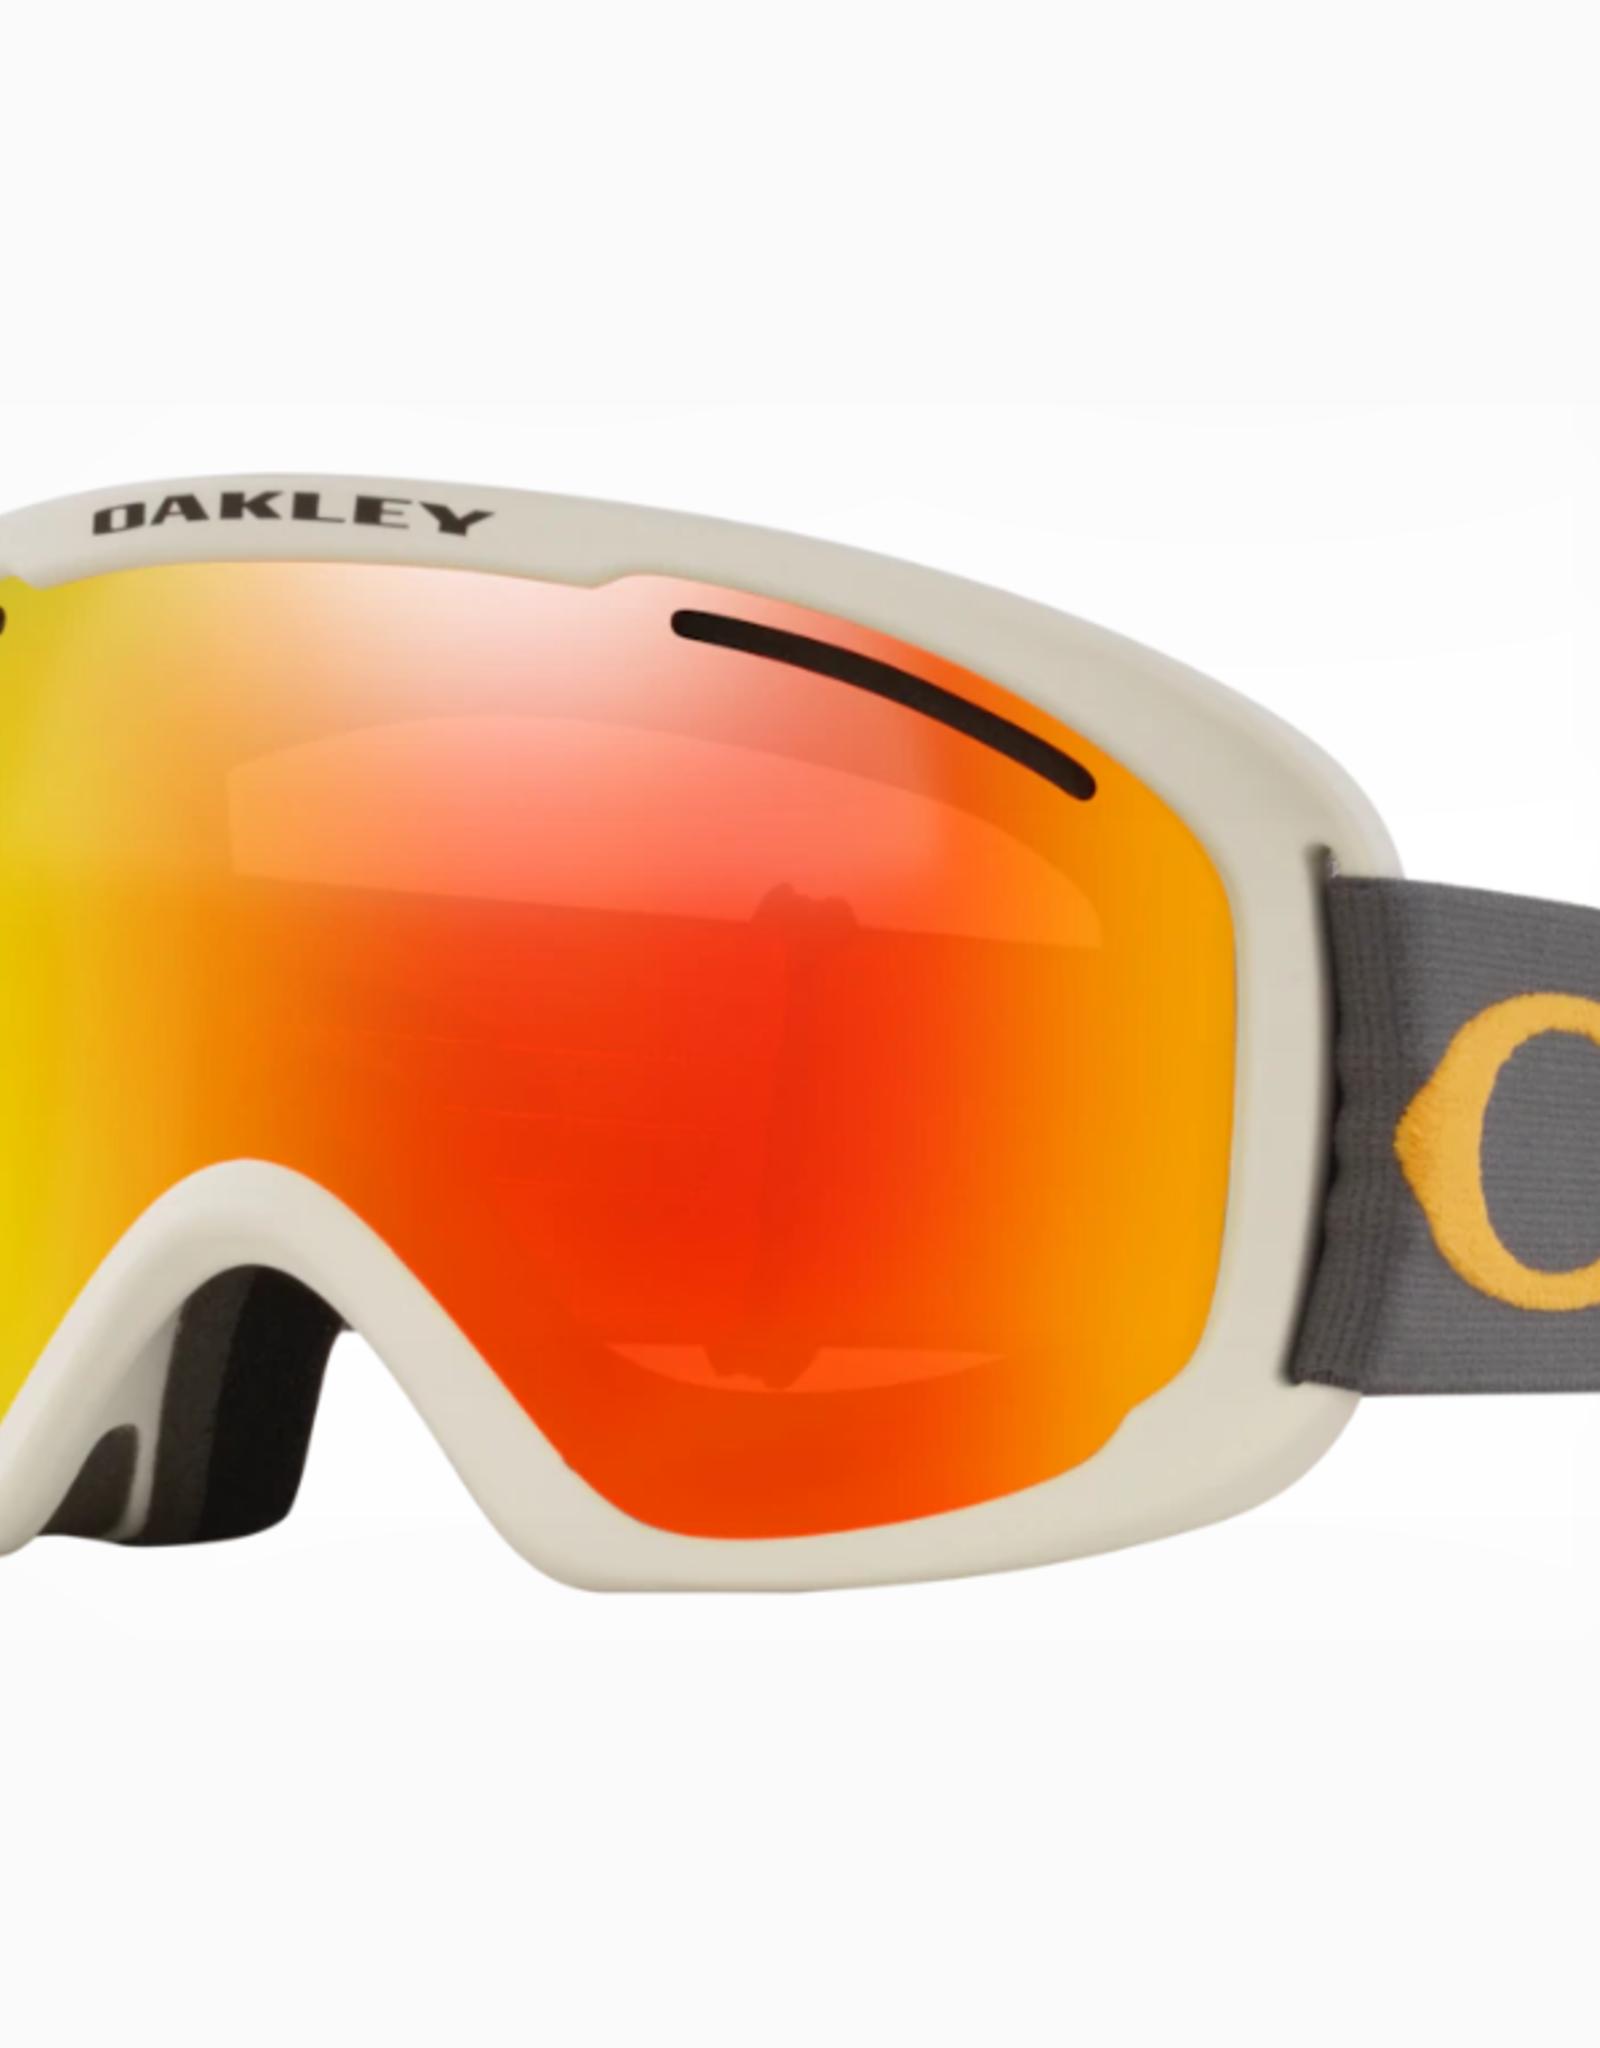 Oakley Oakley - O-FRAME 2 PRO XL - Dark Gry/Org - w/ Fire + Persimmon